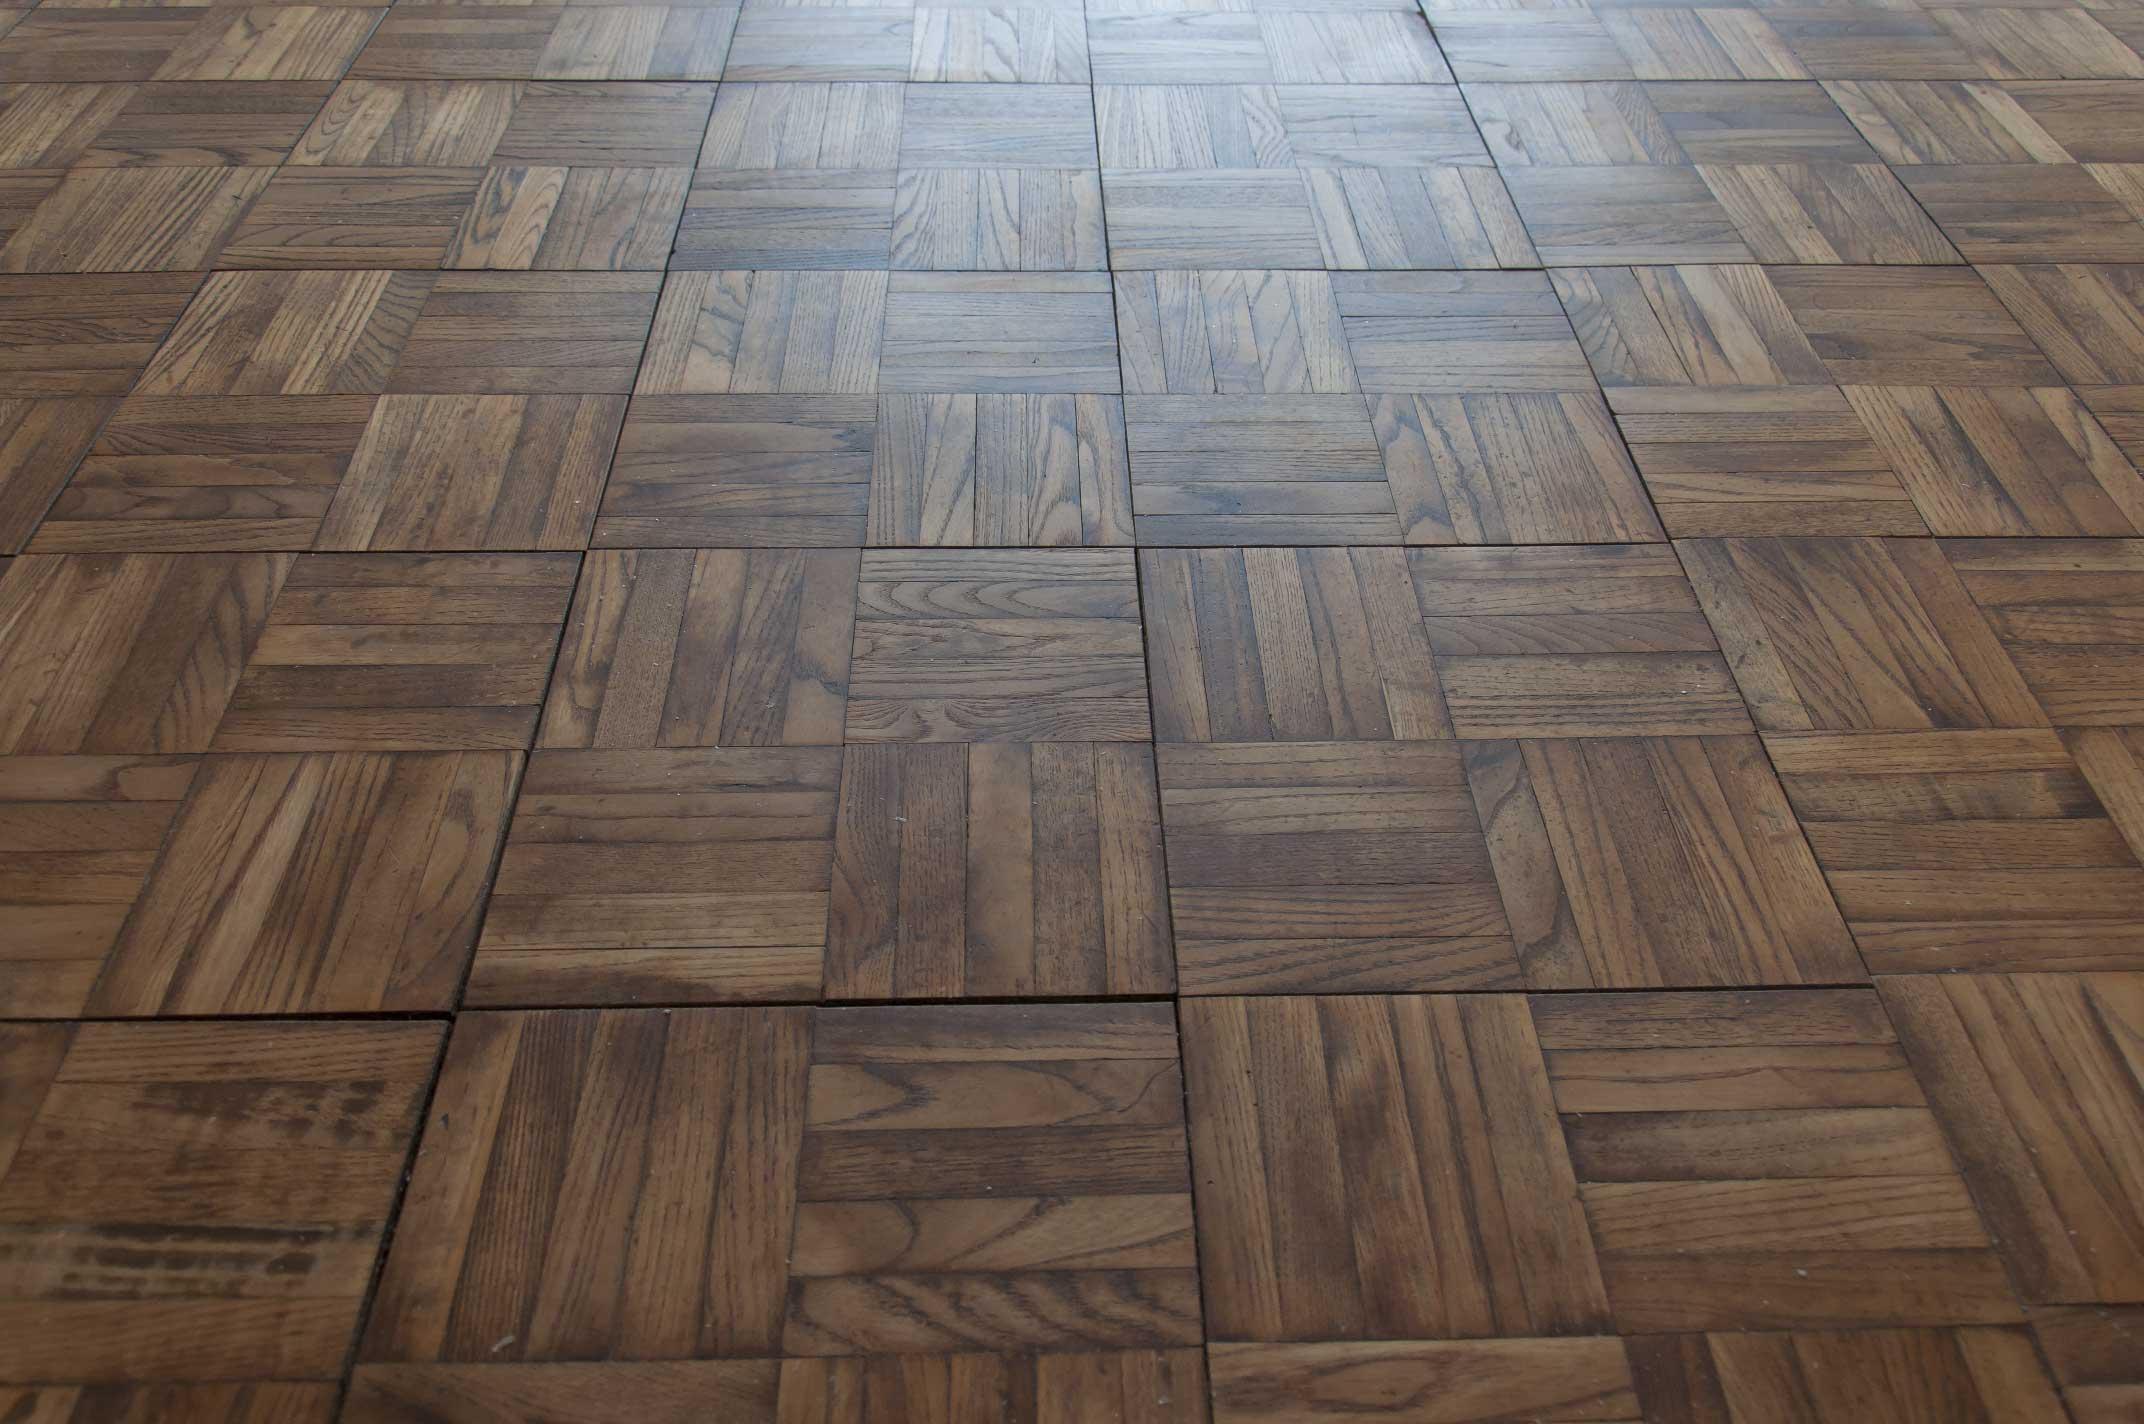 A Parquet Tiled Wood Floor